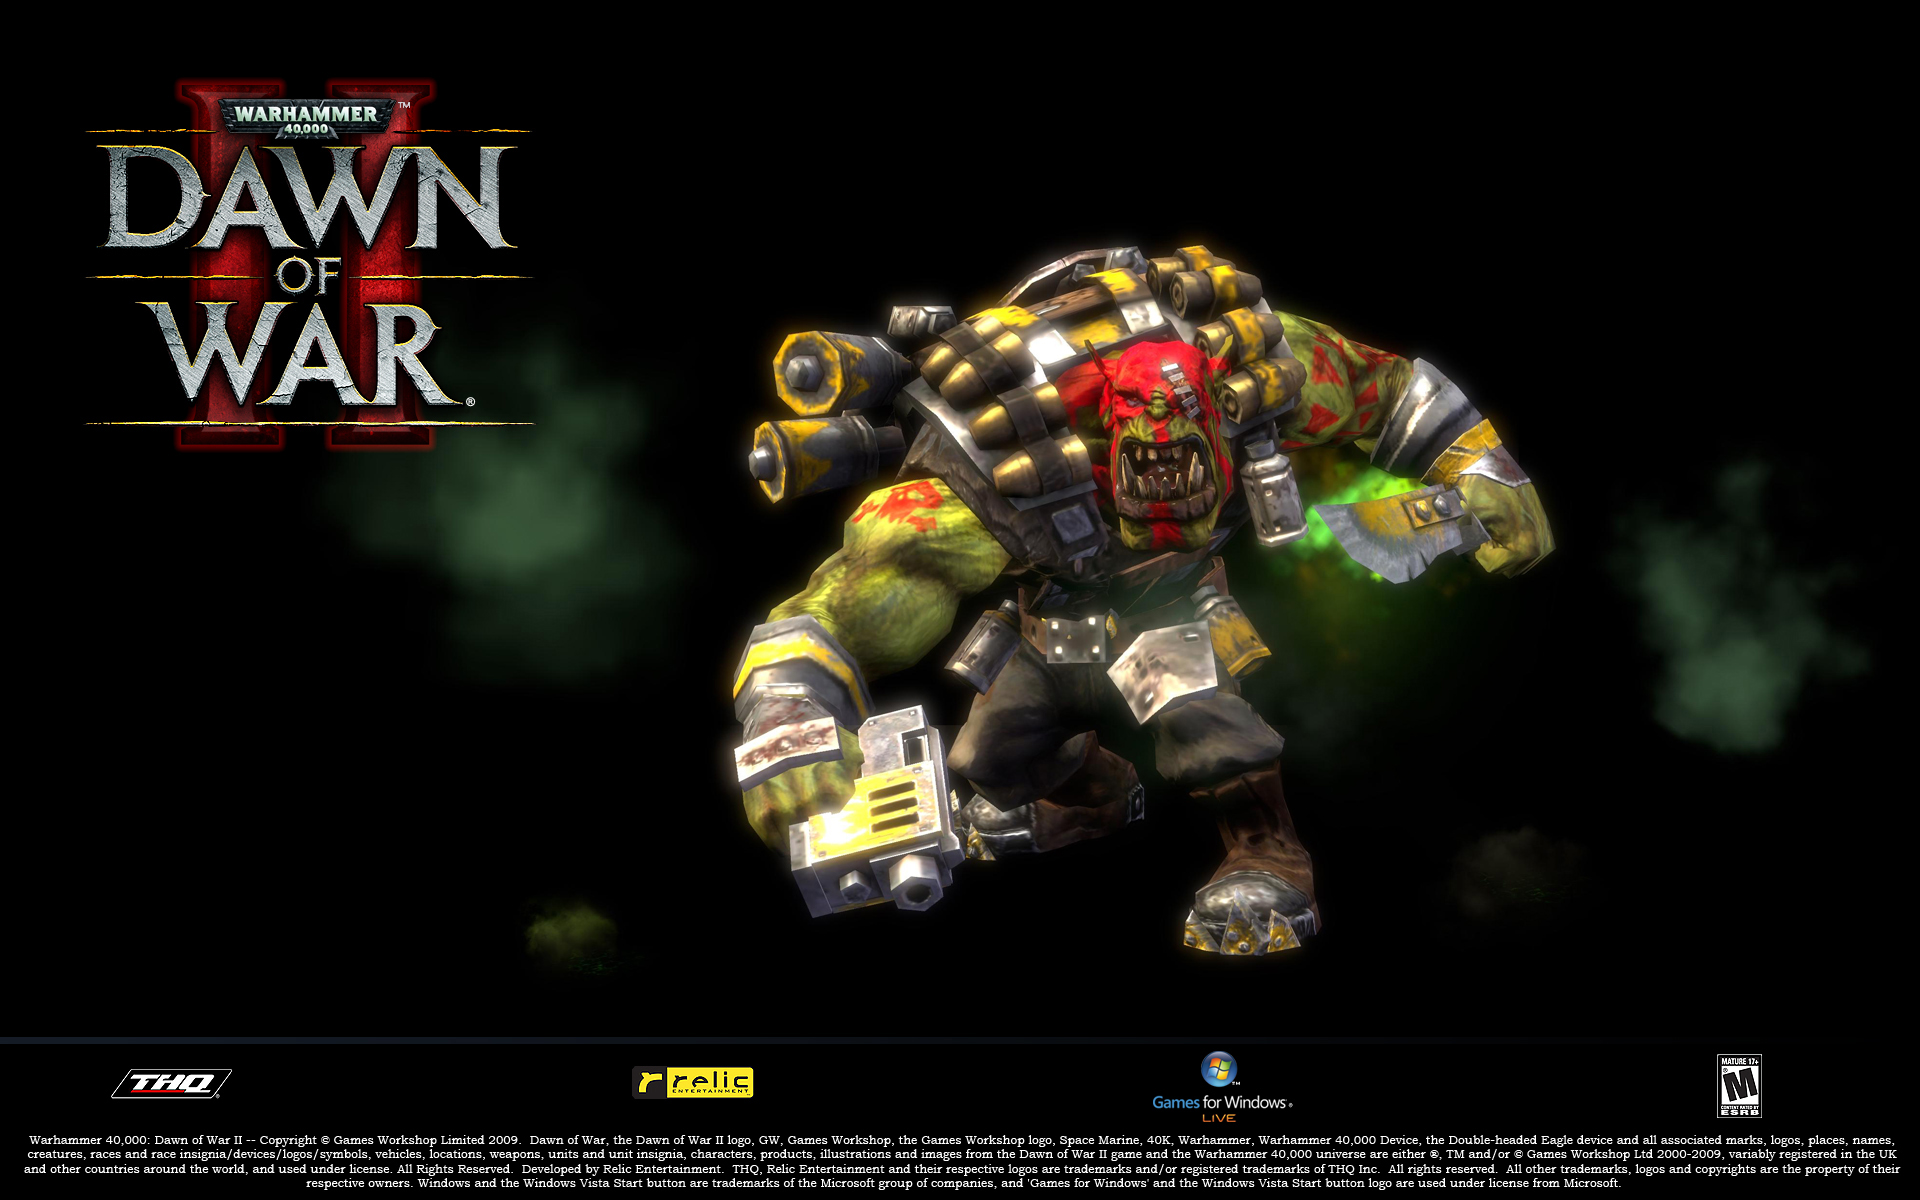 image dow ork kommando nob design jpg dawn of war wiki  dow2 ork kommando nob design jpg